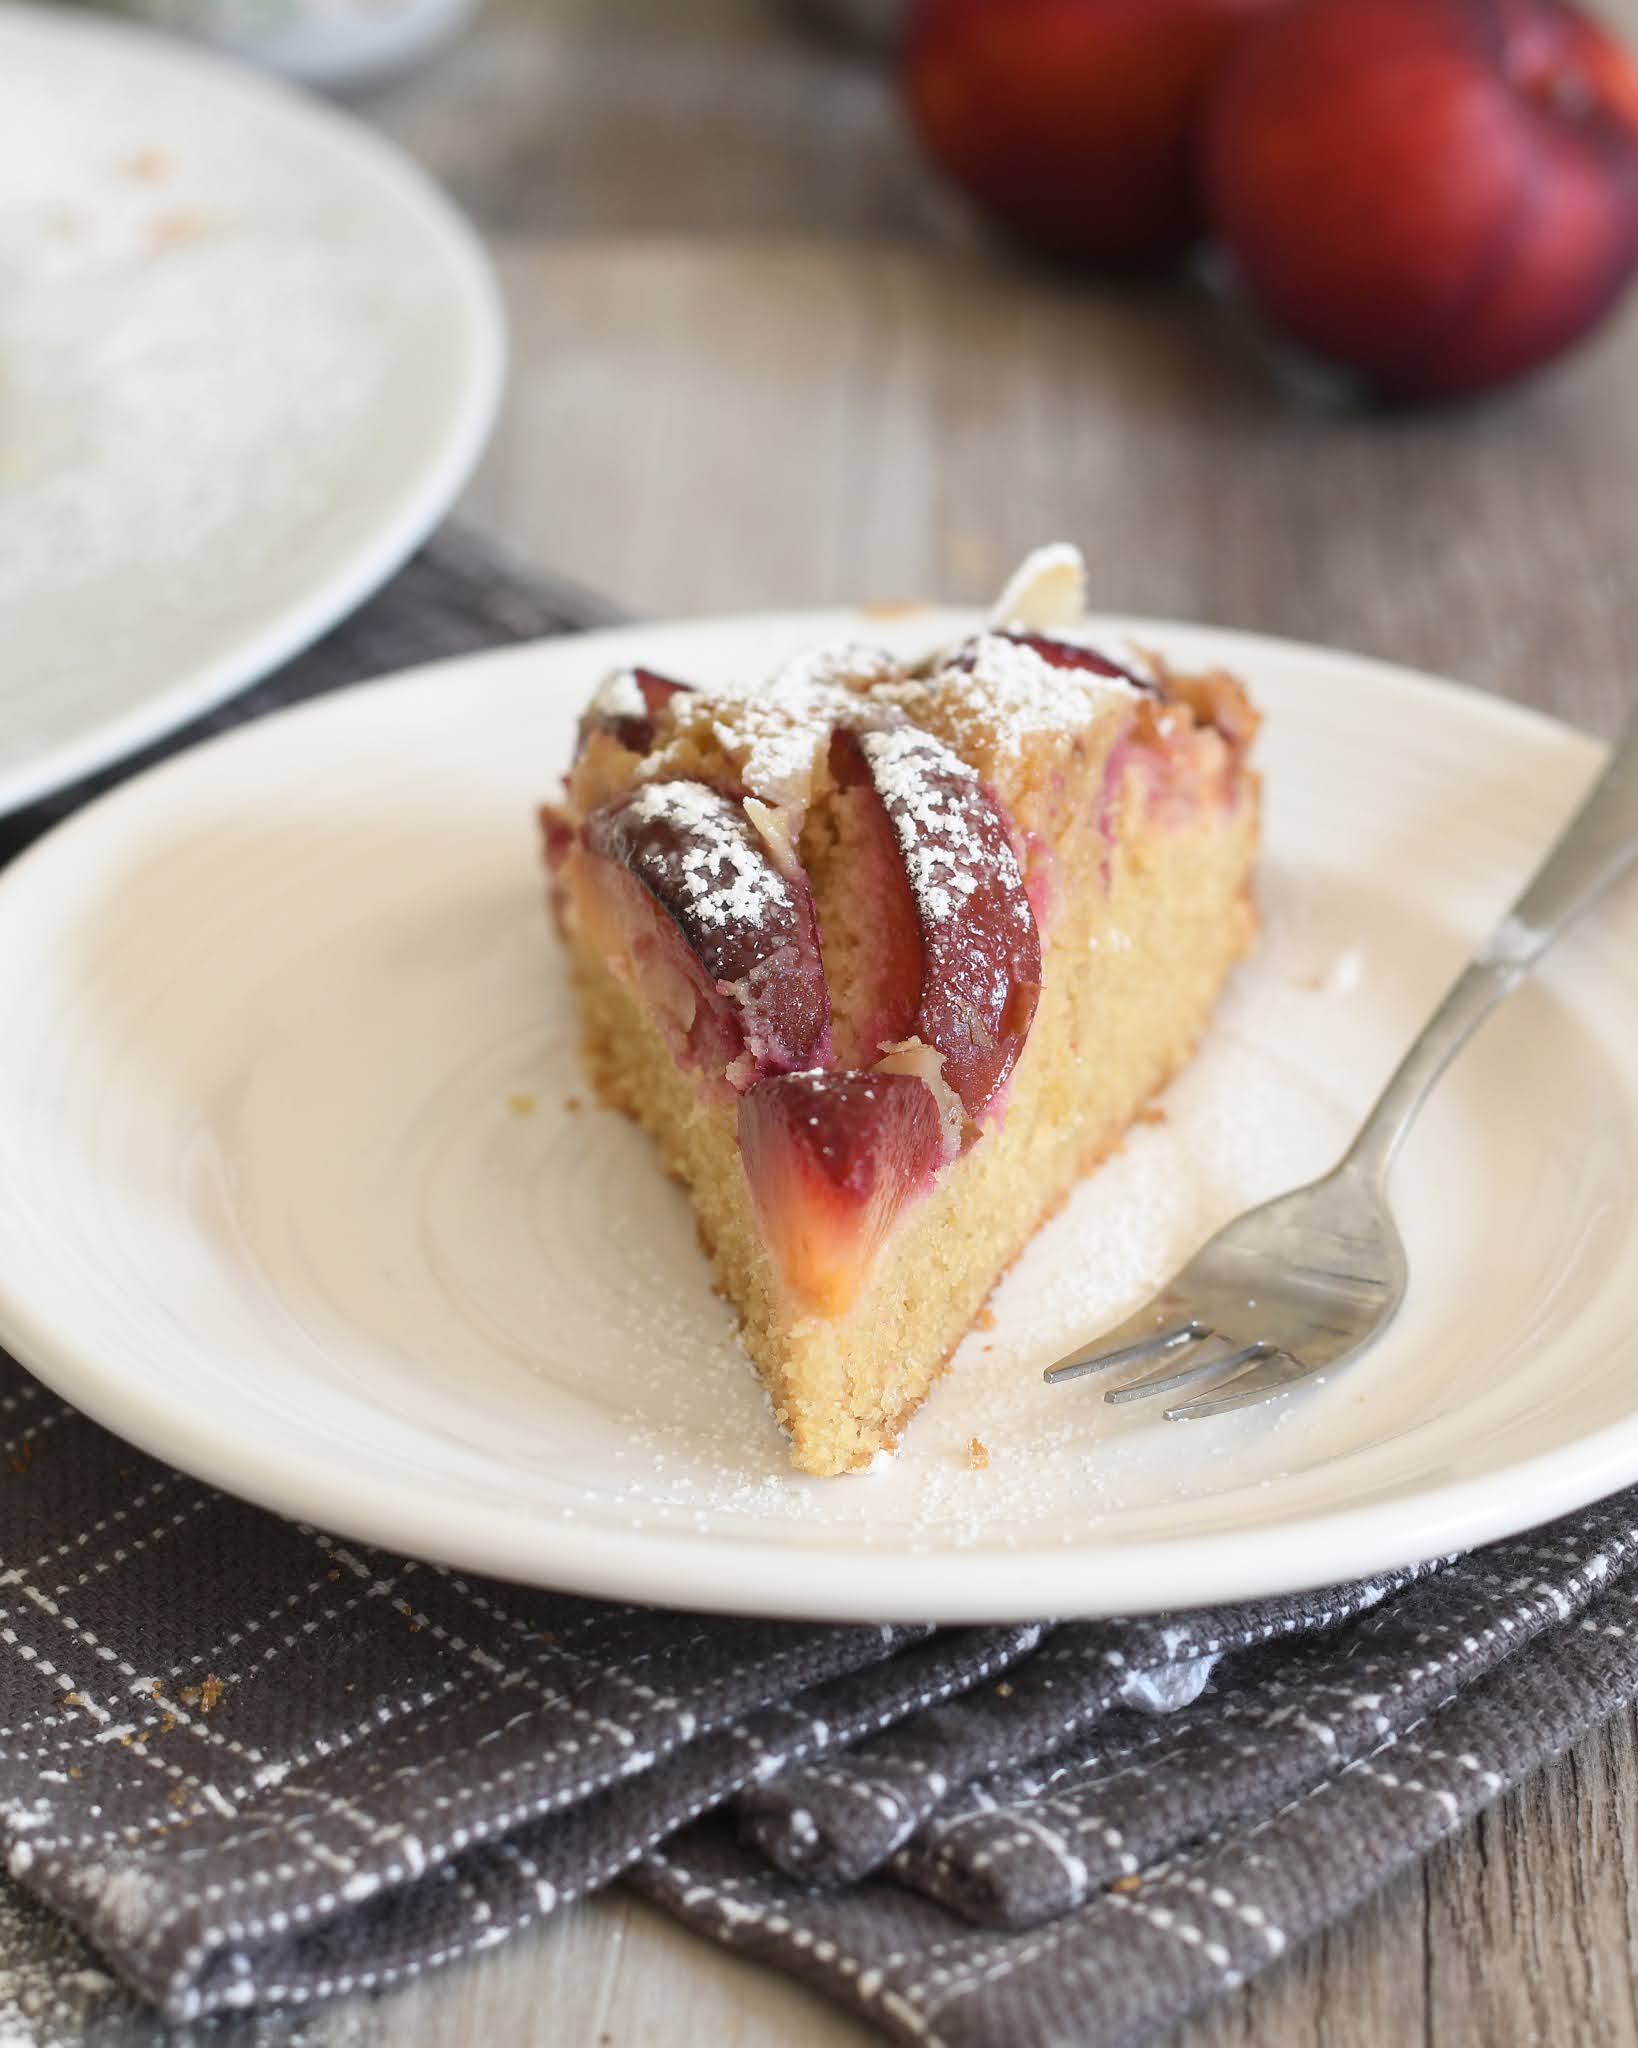 Plum and Almond Cake